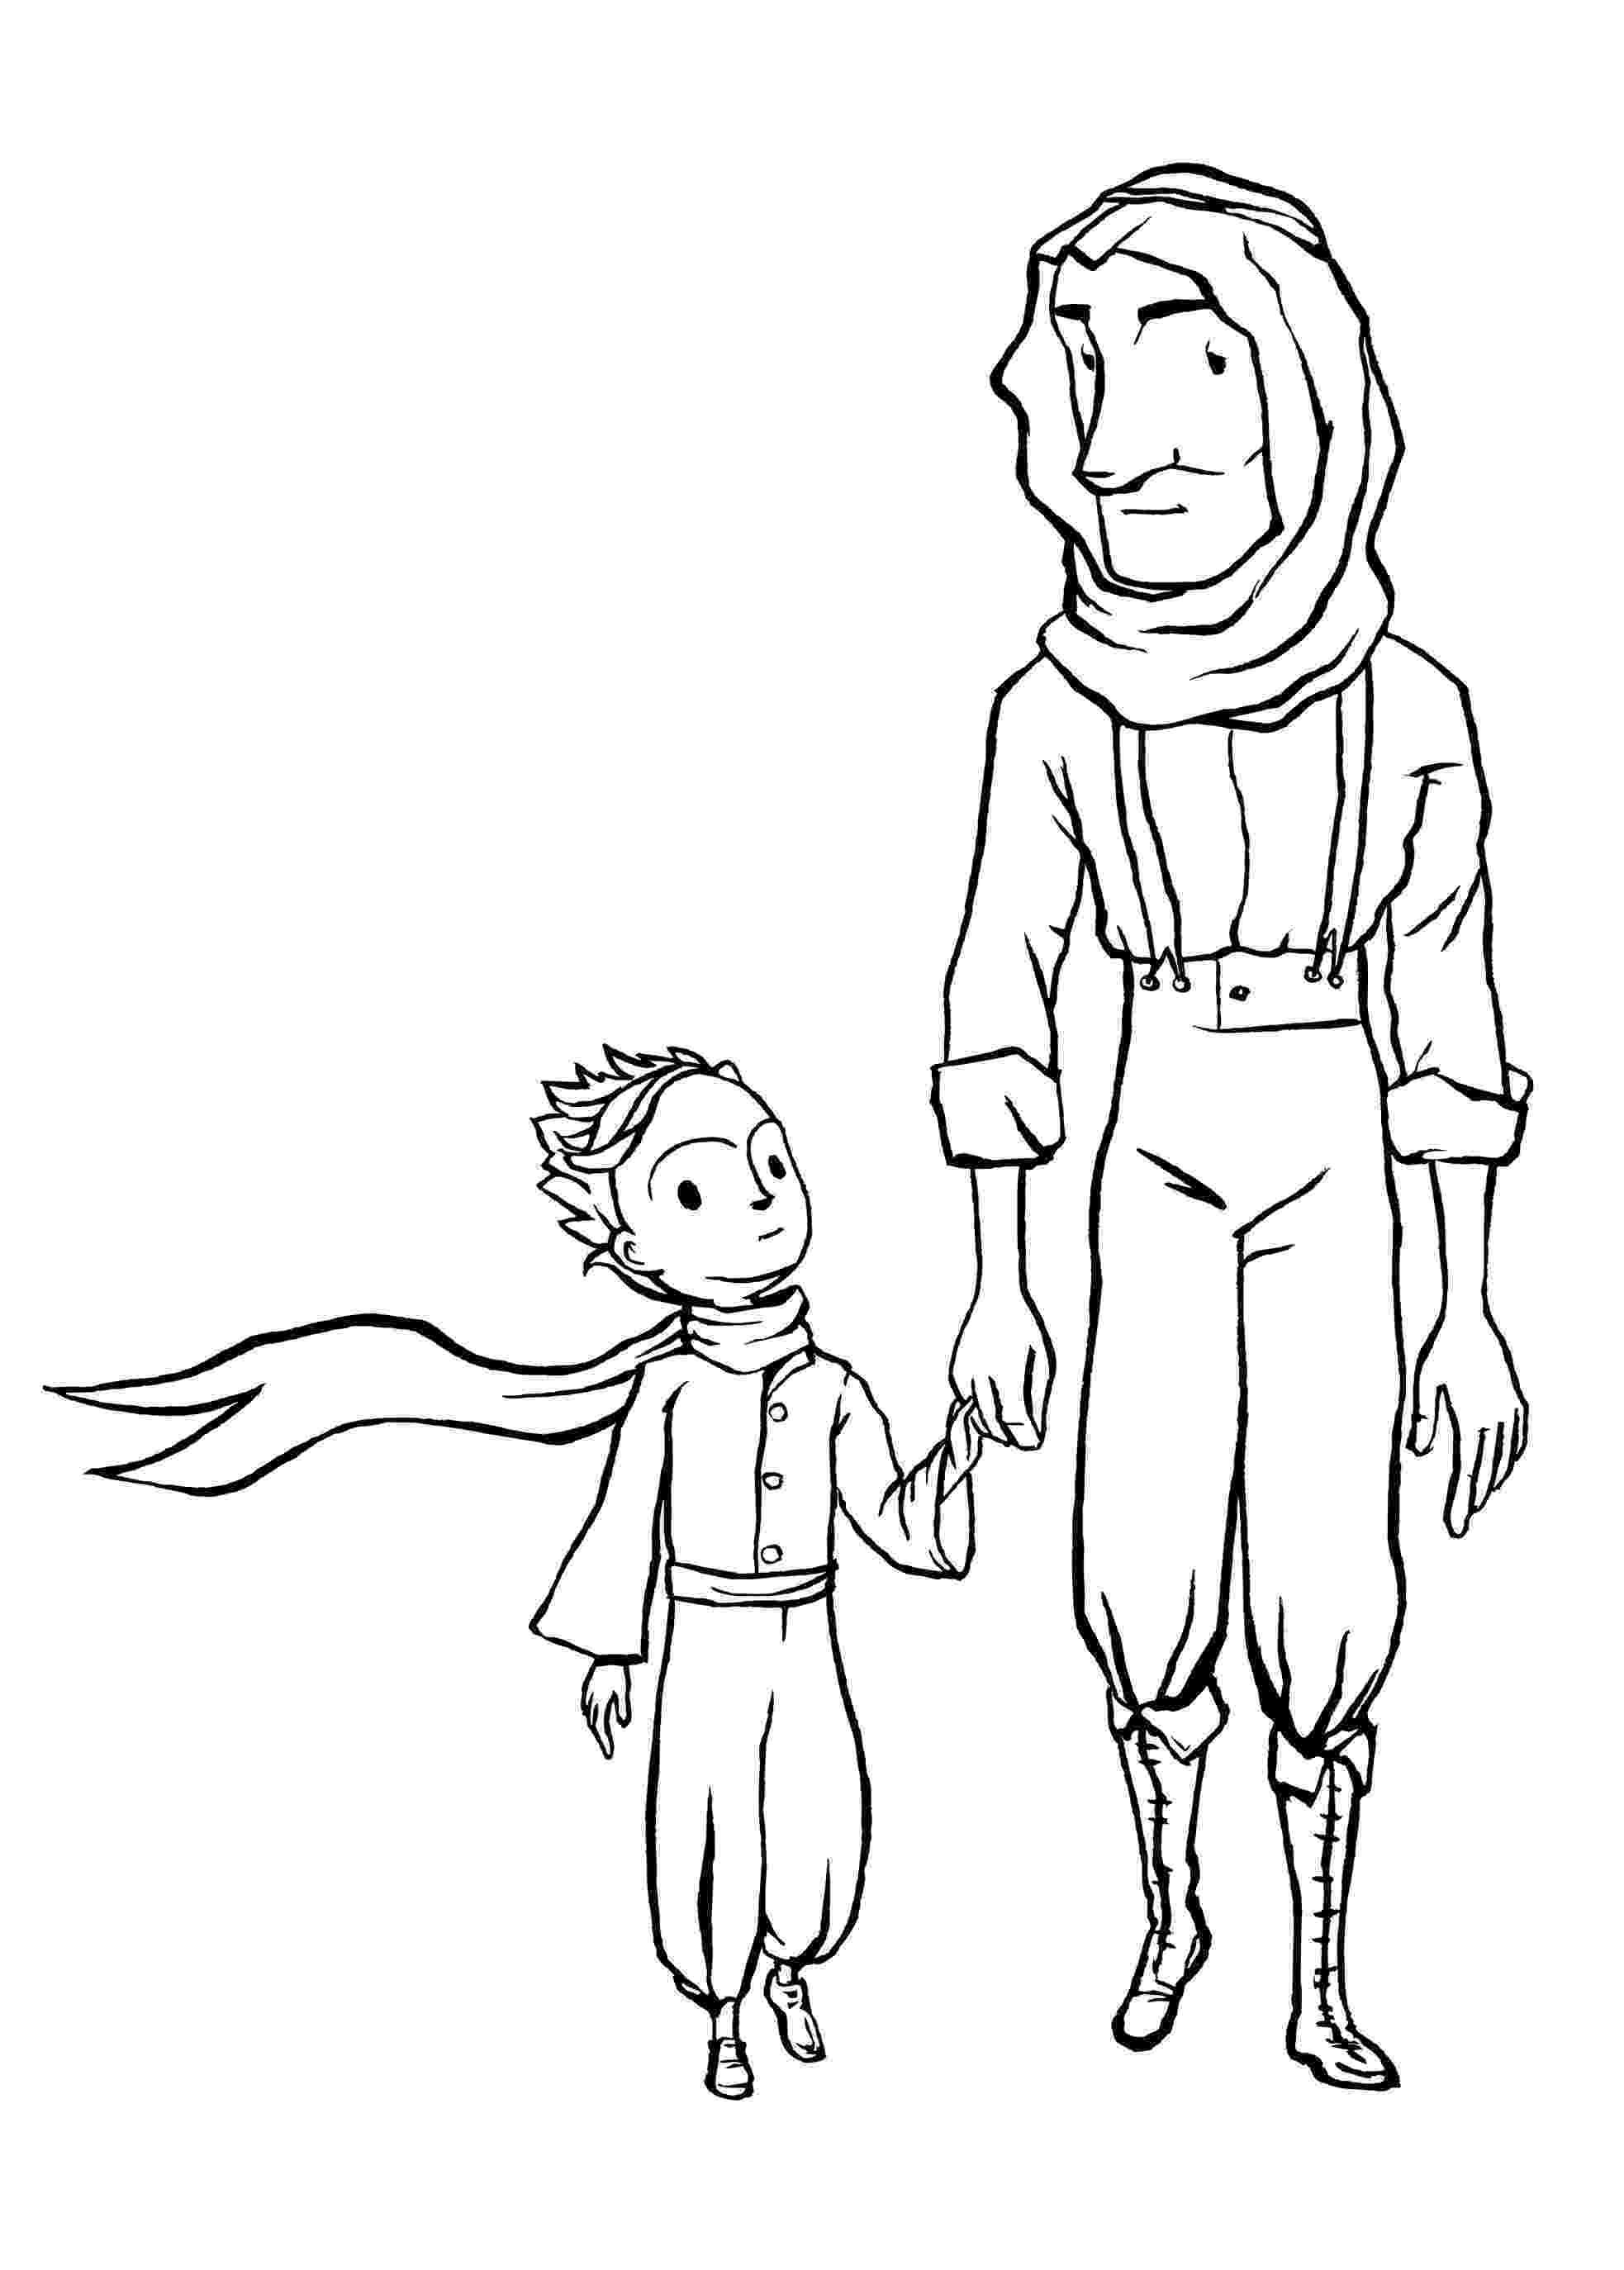 le coloring sheet le petit prince to download for free le petit prince sheet le coloring